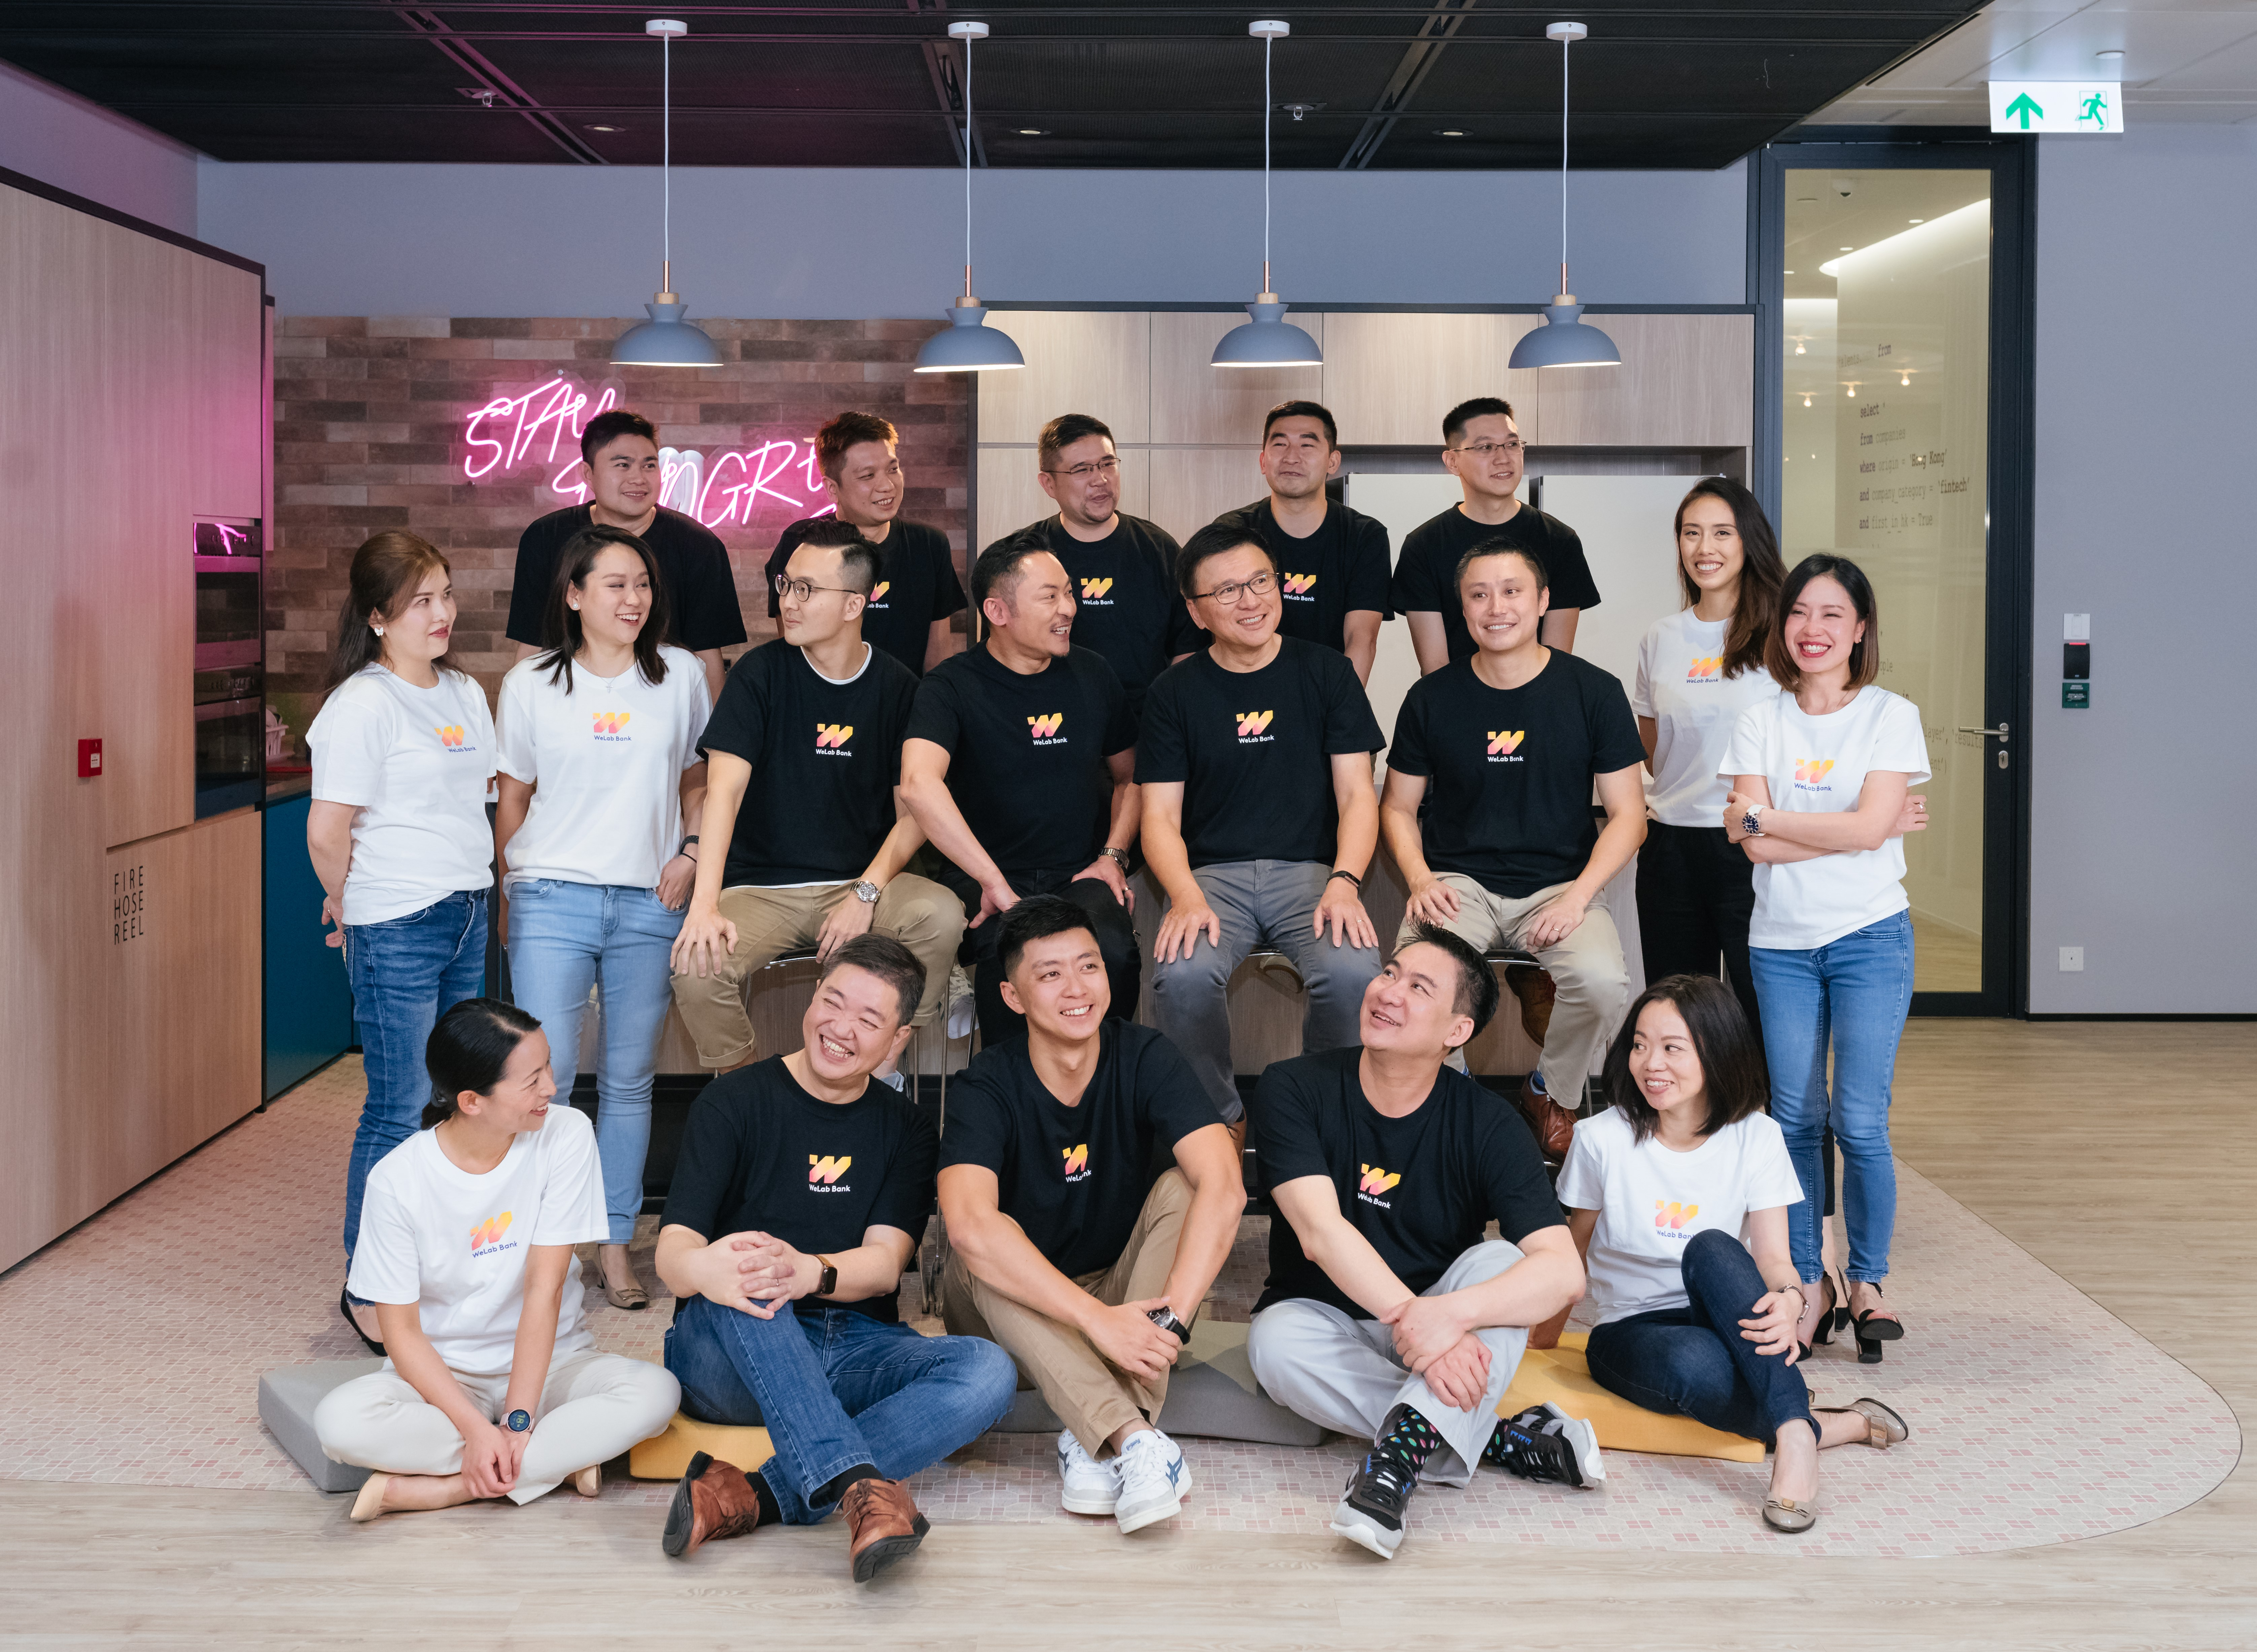 Hong Kong fintech unicorn WeLab raises $75M led by insurance giant Allianz